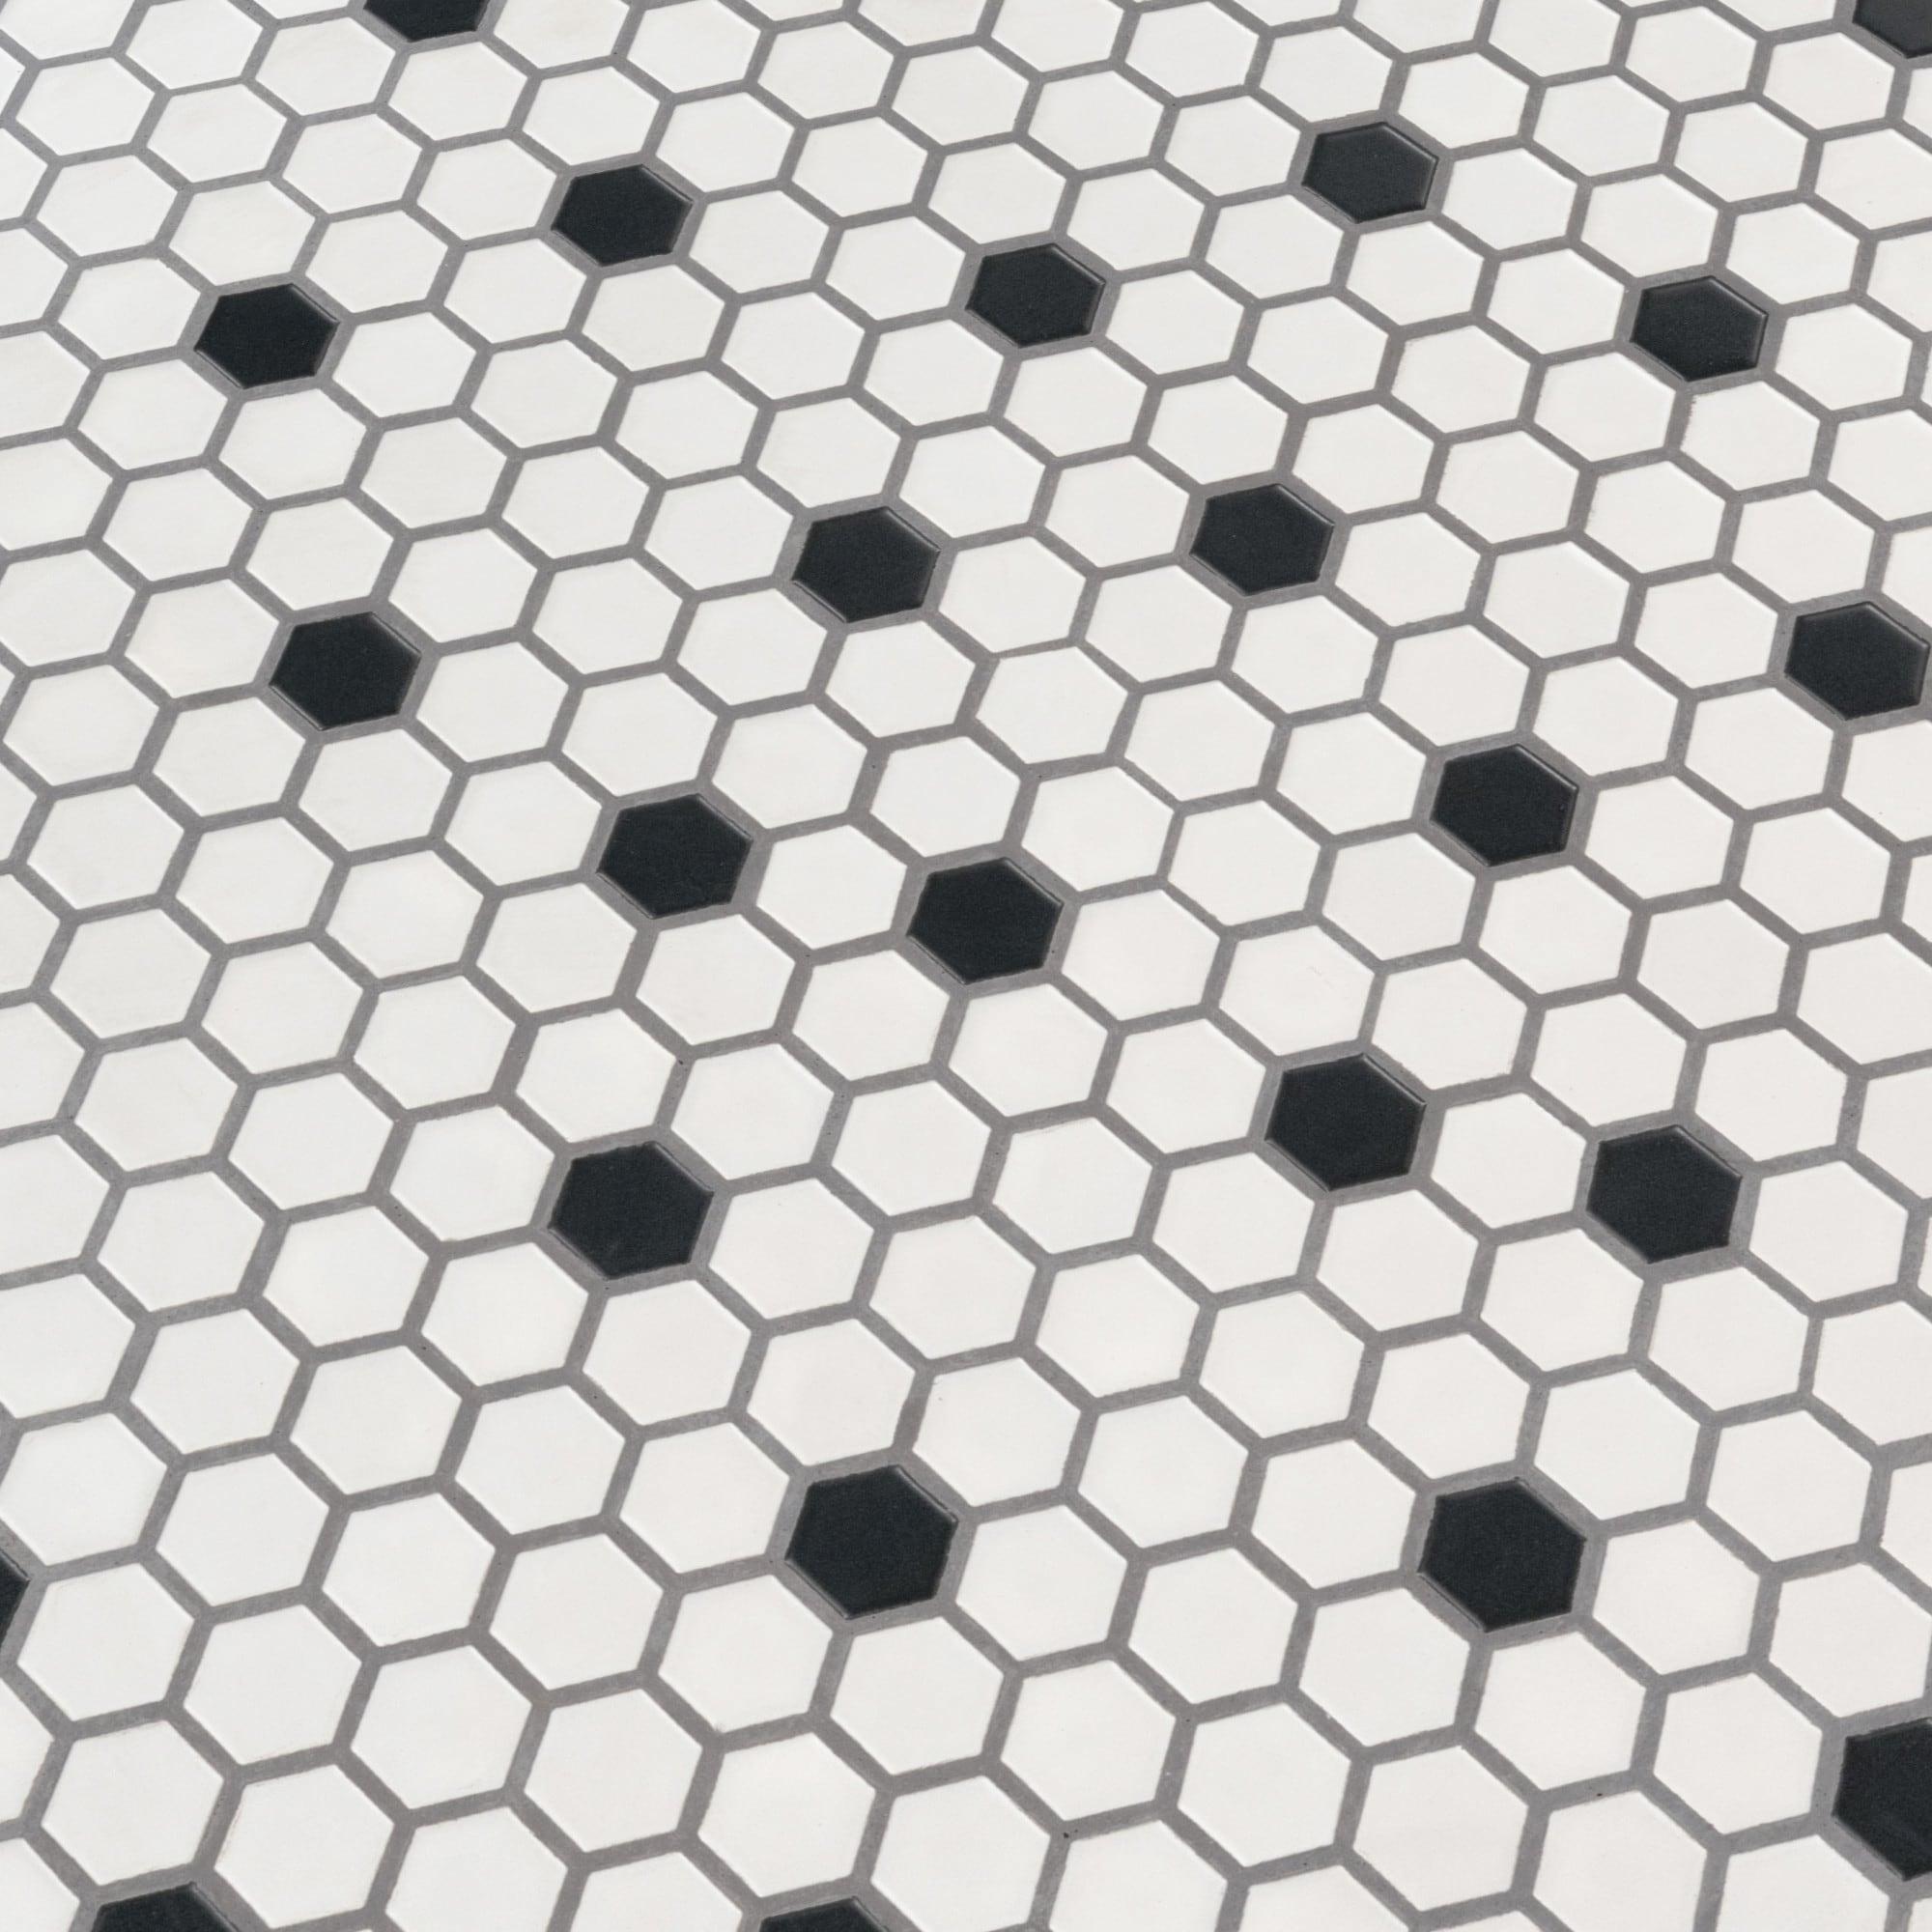 Msi N1x1hex Domino 1 X 1 Hexagon Mosaic Tile Matte Porcelain Visual Sold By Carton 19 09 Sf Carton Black White Overstock 29778075